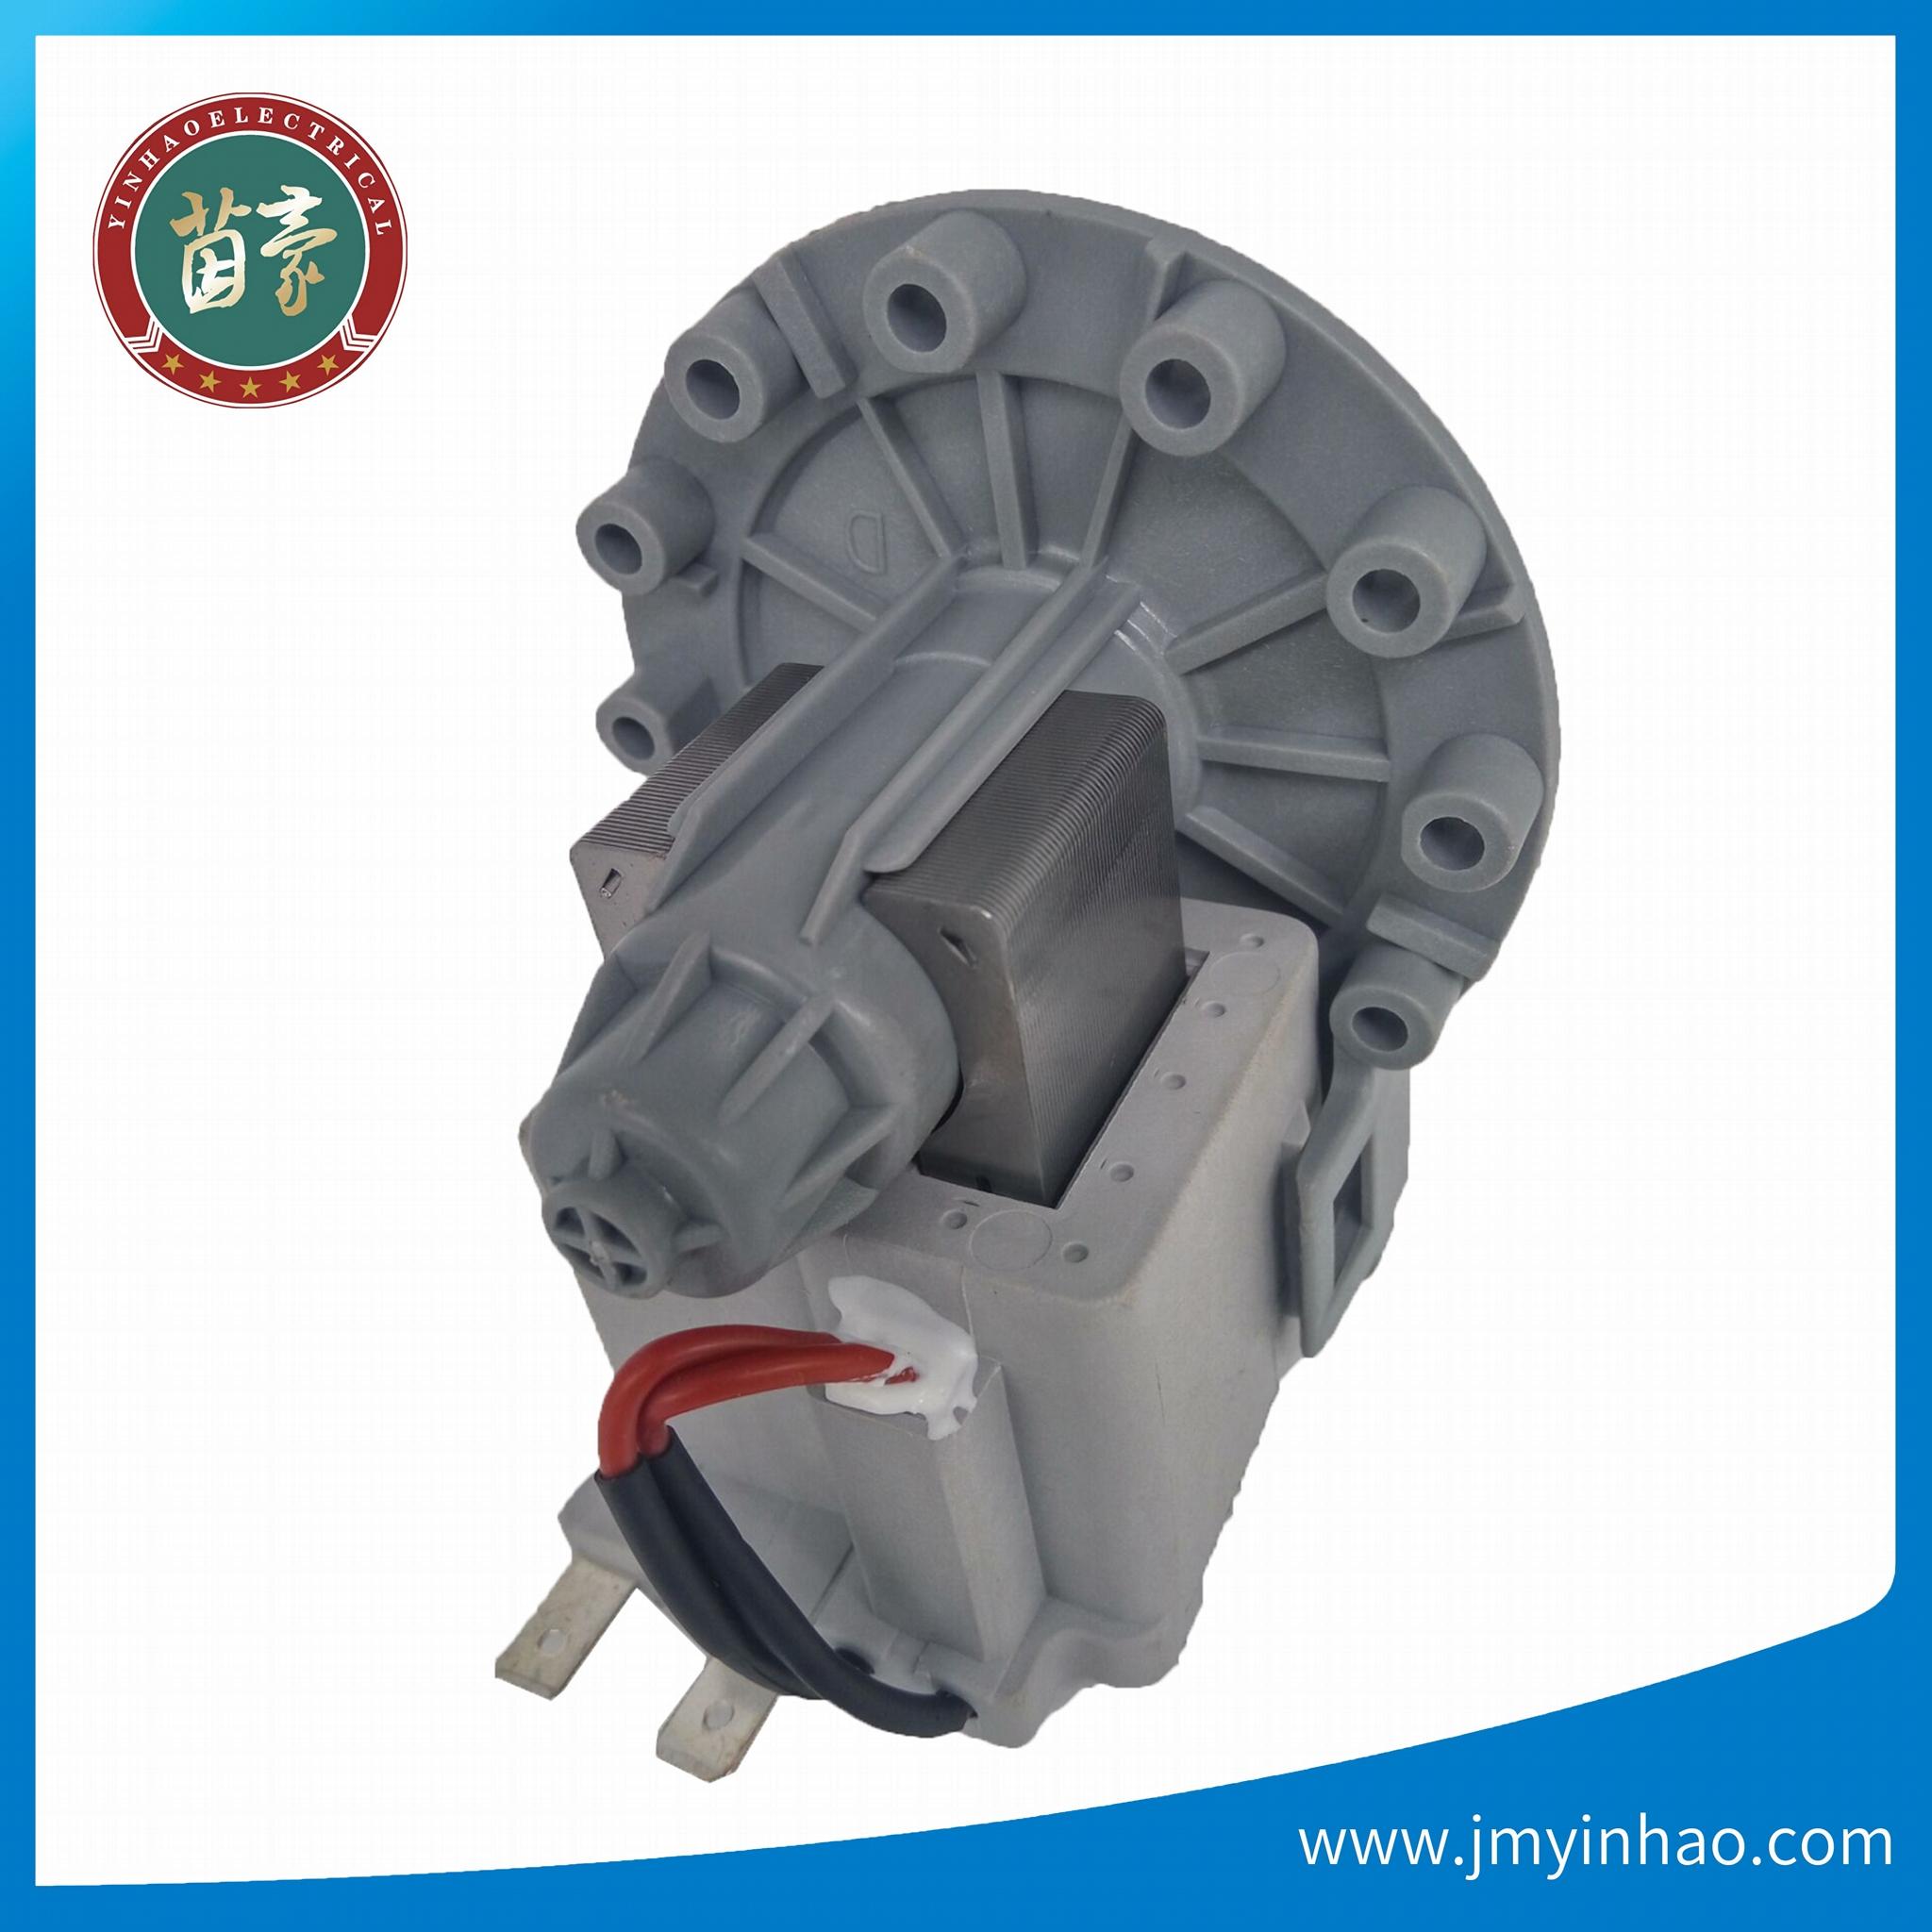 120vac motor de bomba de drenaje de lavadora 1